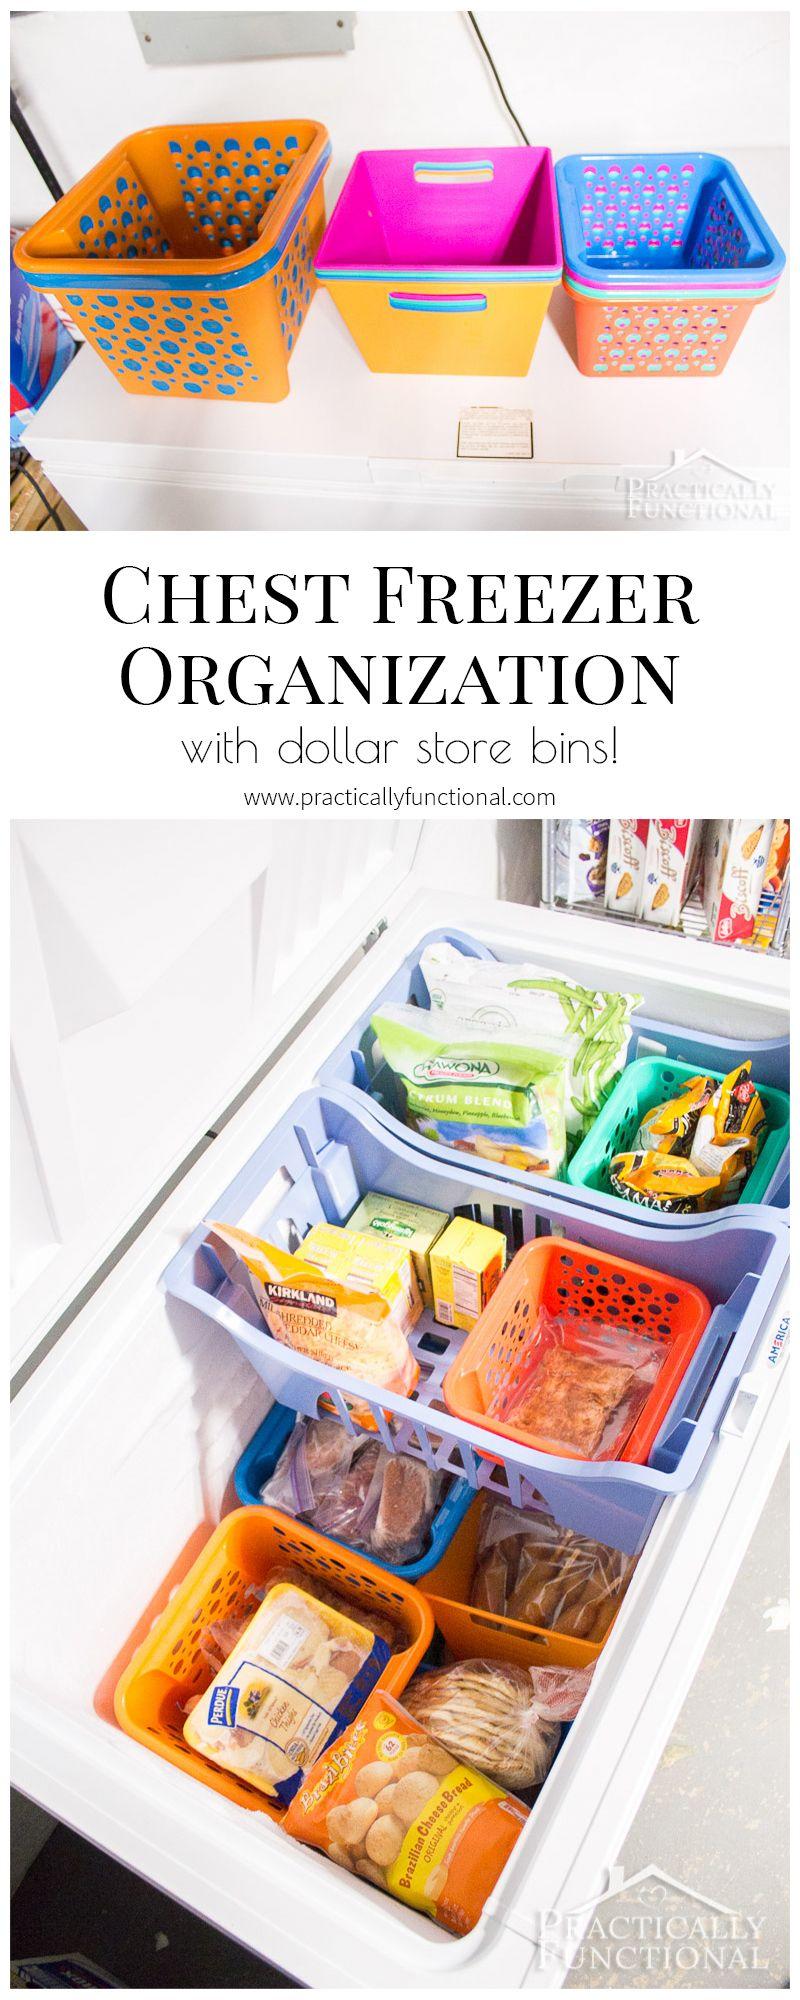 Our Chest Freezer Organization System Freezer Organization Chest Freezer Organization Deep Pantry Organization